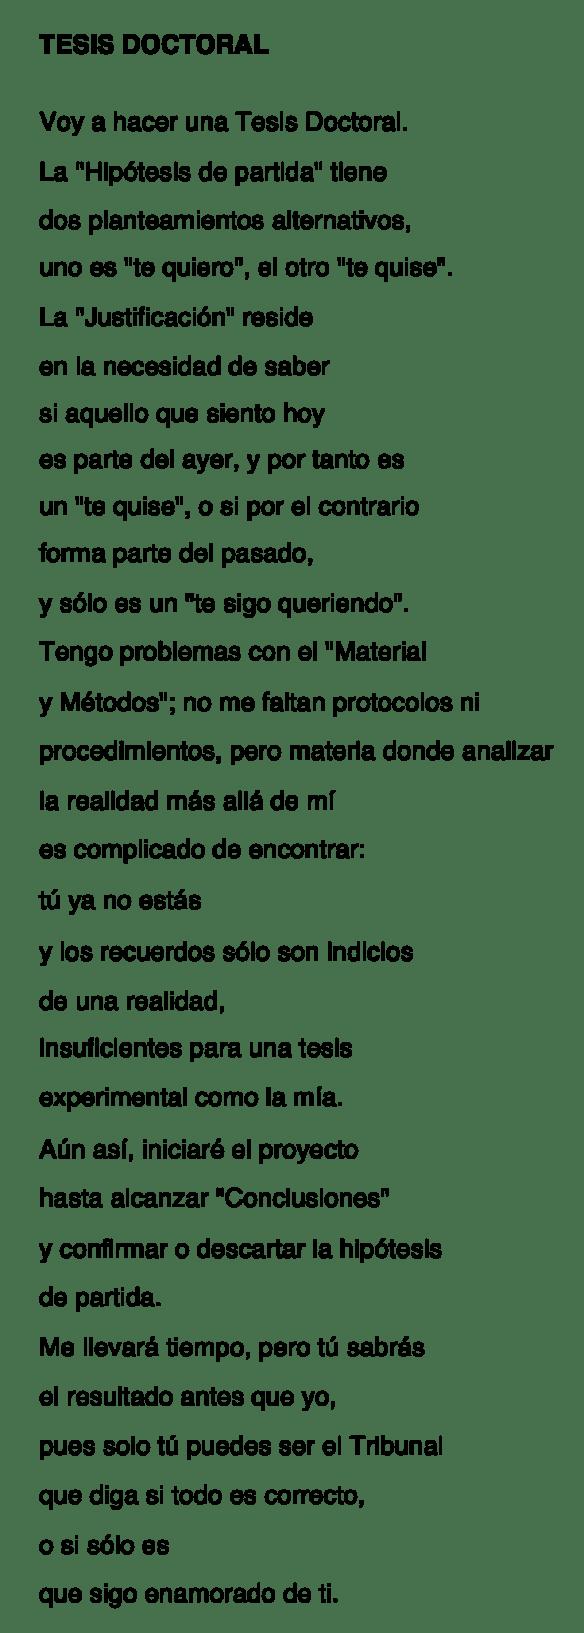 TESIS DOCTORAL-MLA-12-4-15